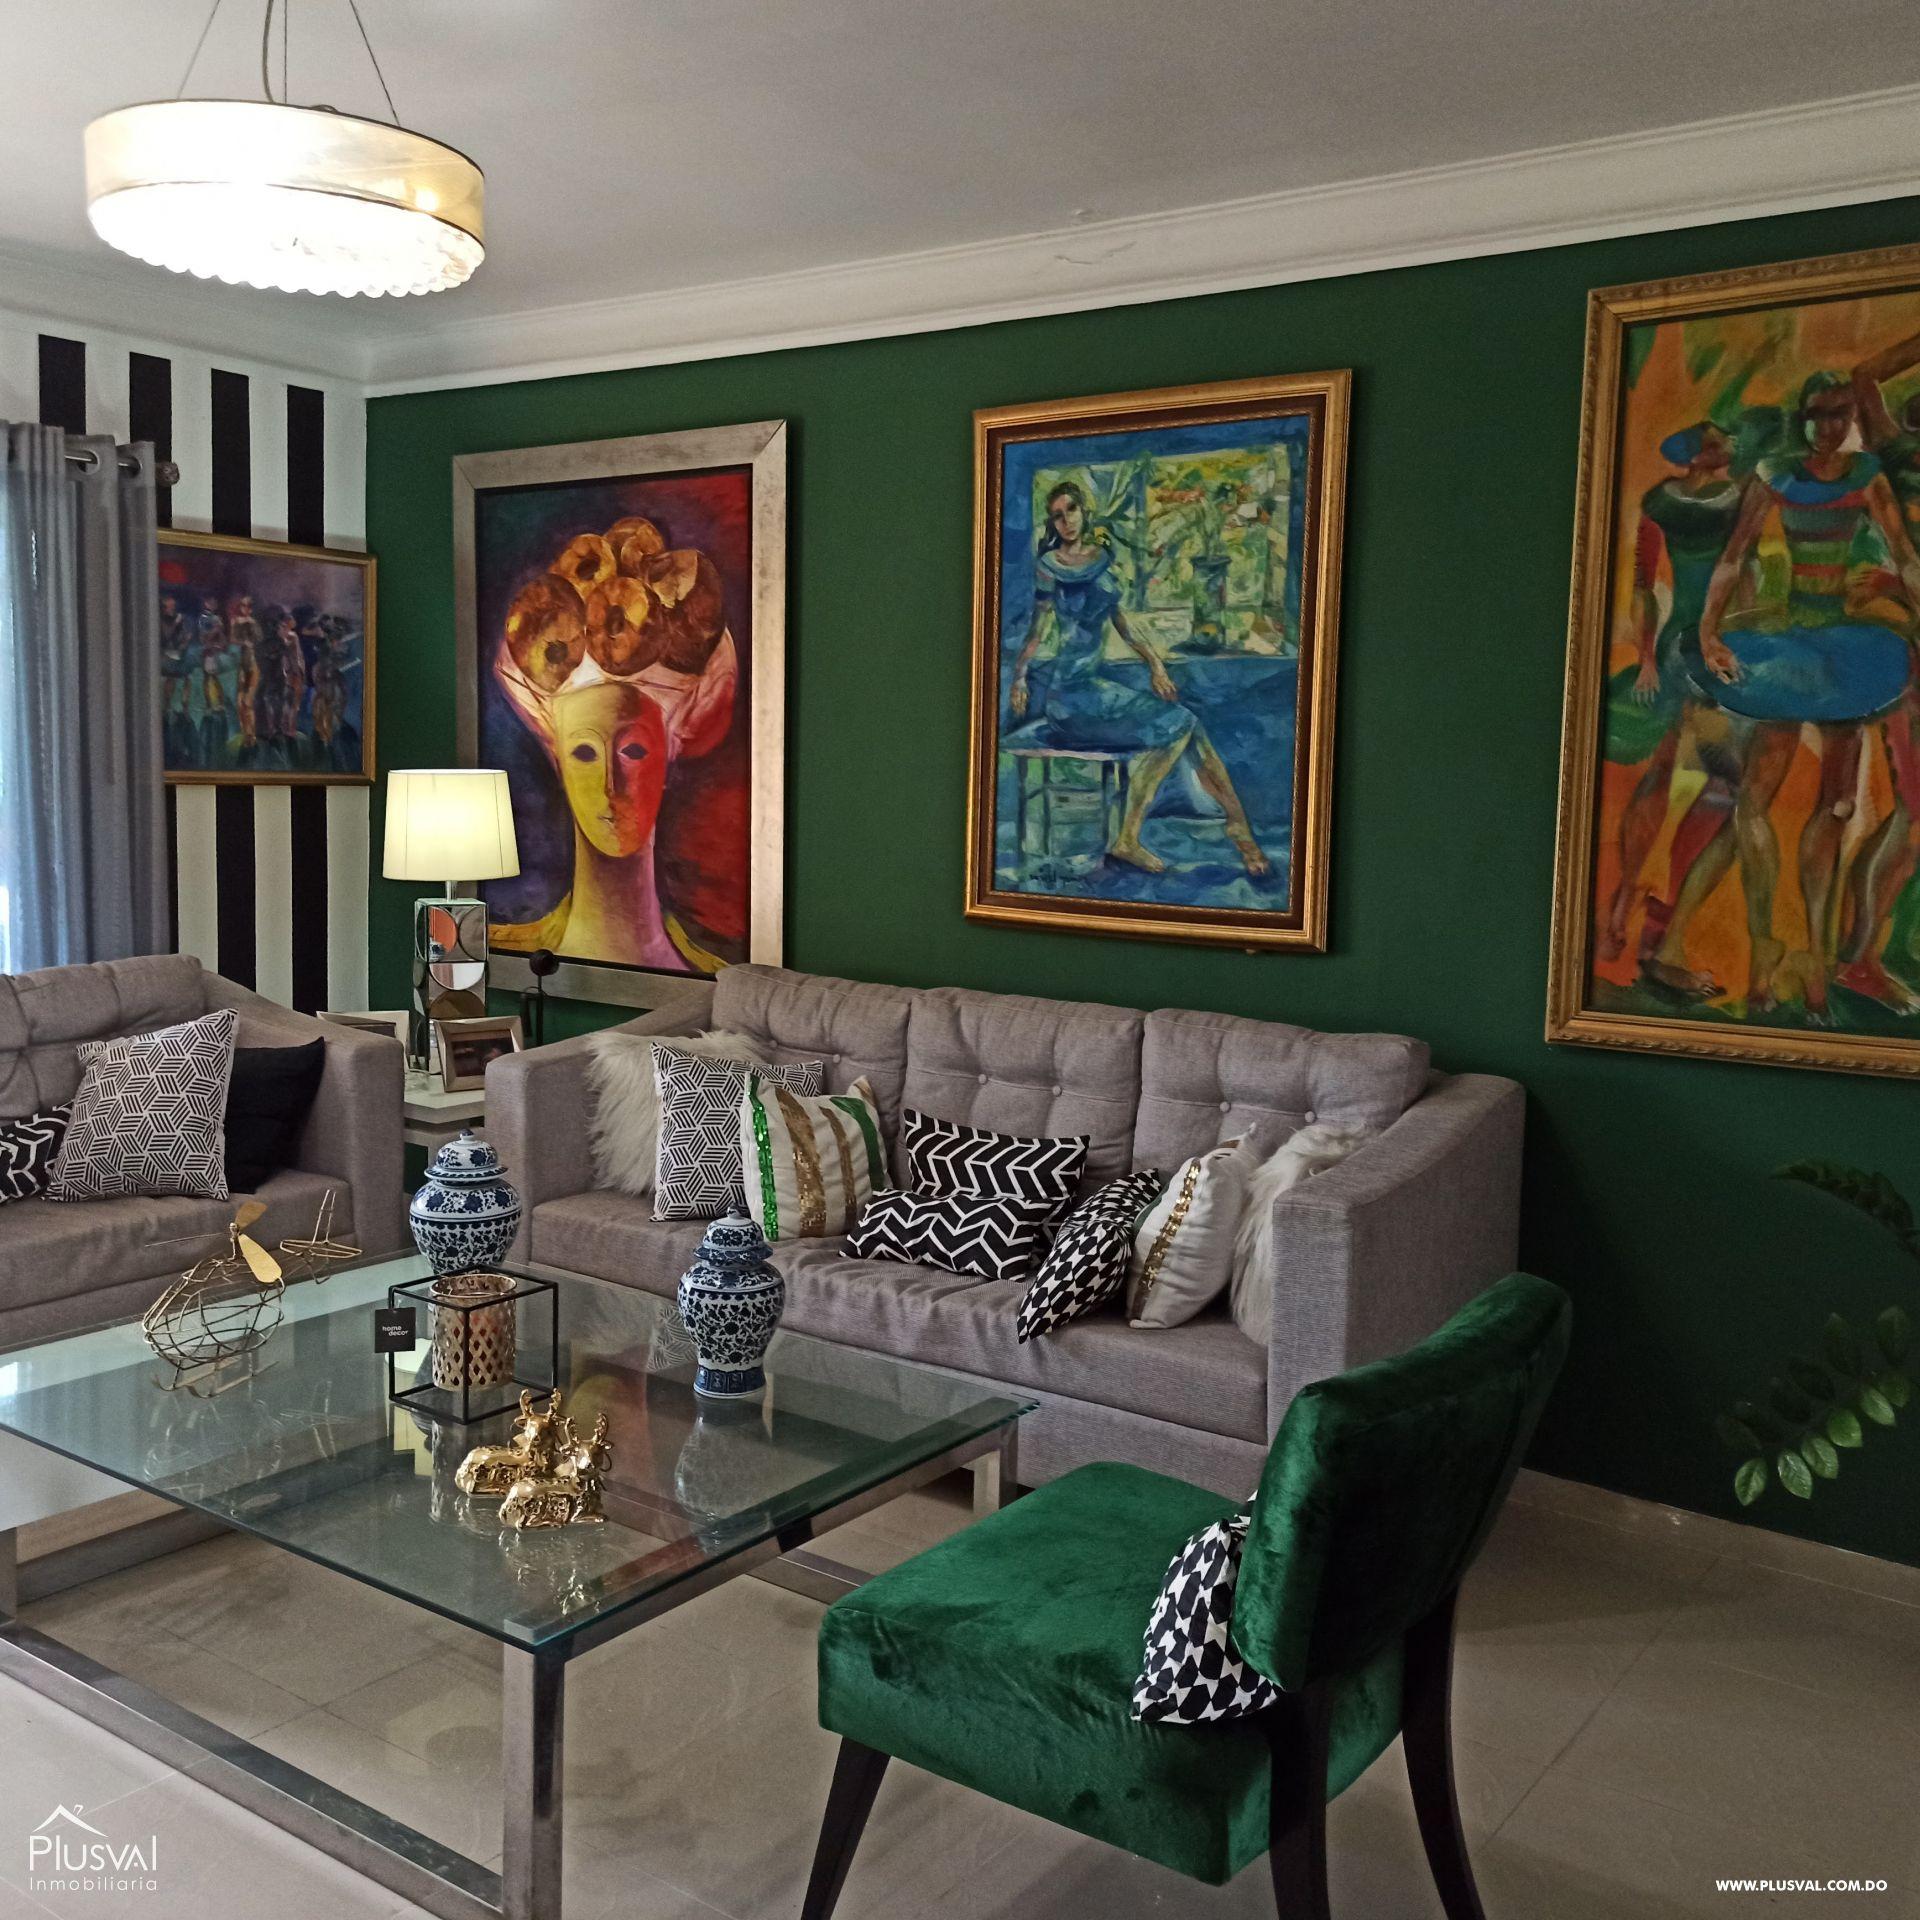 Apto. tipo Pent House, Zona residencial, muy tranquila, terraza techada y Aire libre.